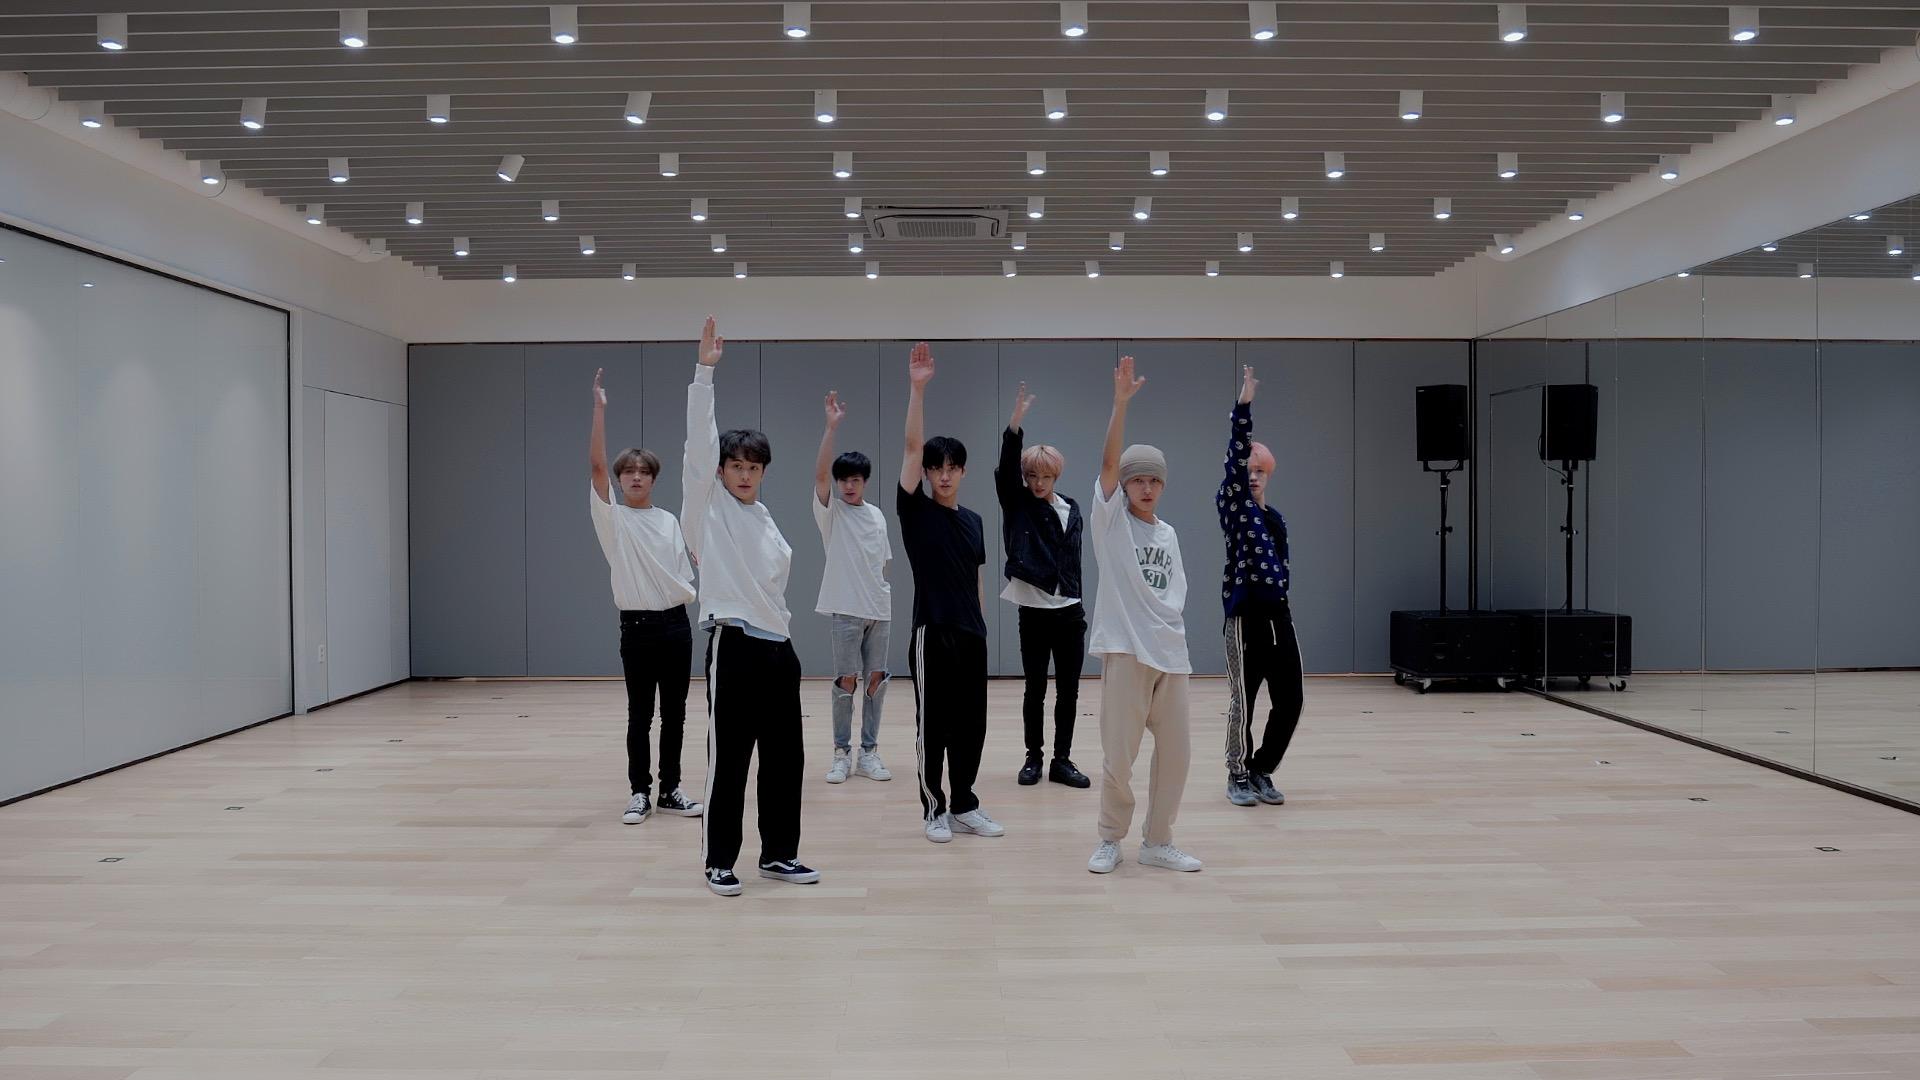 NCT DREAM 엔시티 드림 'Hello Future' Dance Practice